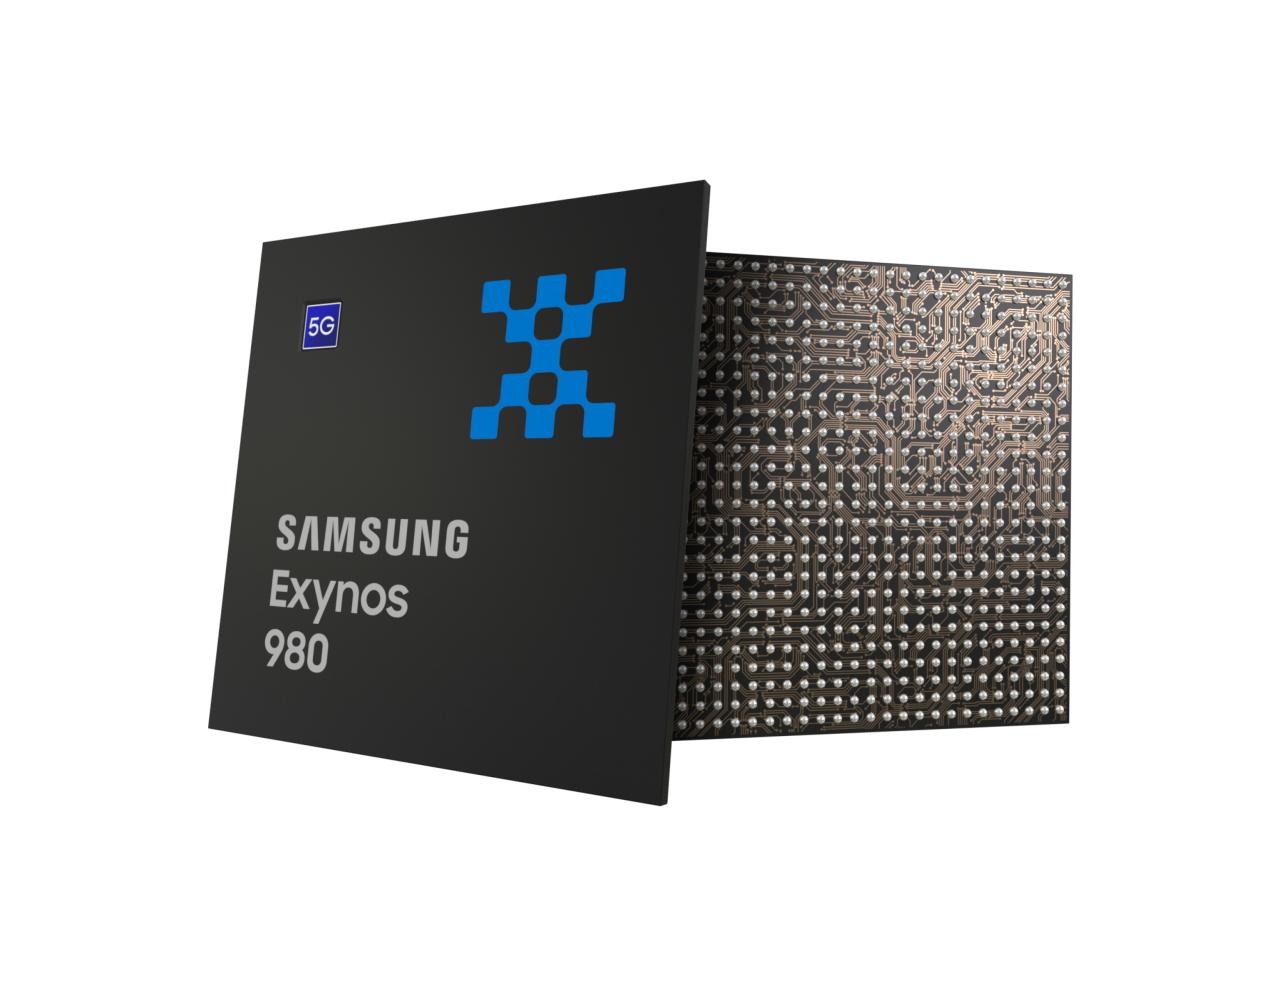 Exynos 980 (Samsung Electronics)